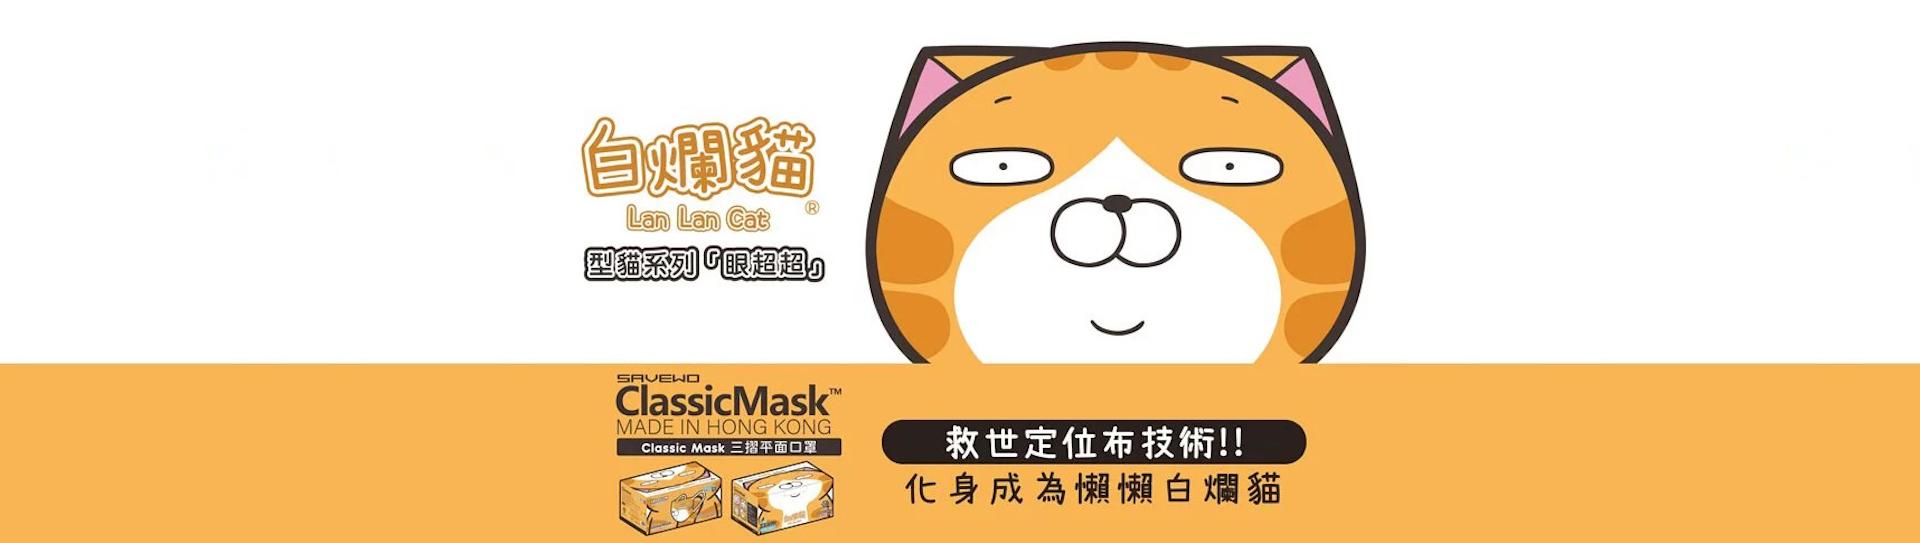 SAVEWO X 白爛貓 型貓系列「眼超超」三摺平面口罩